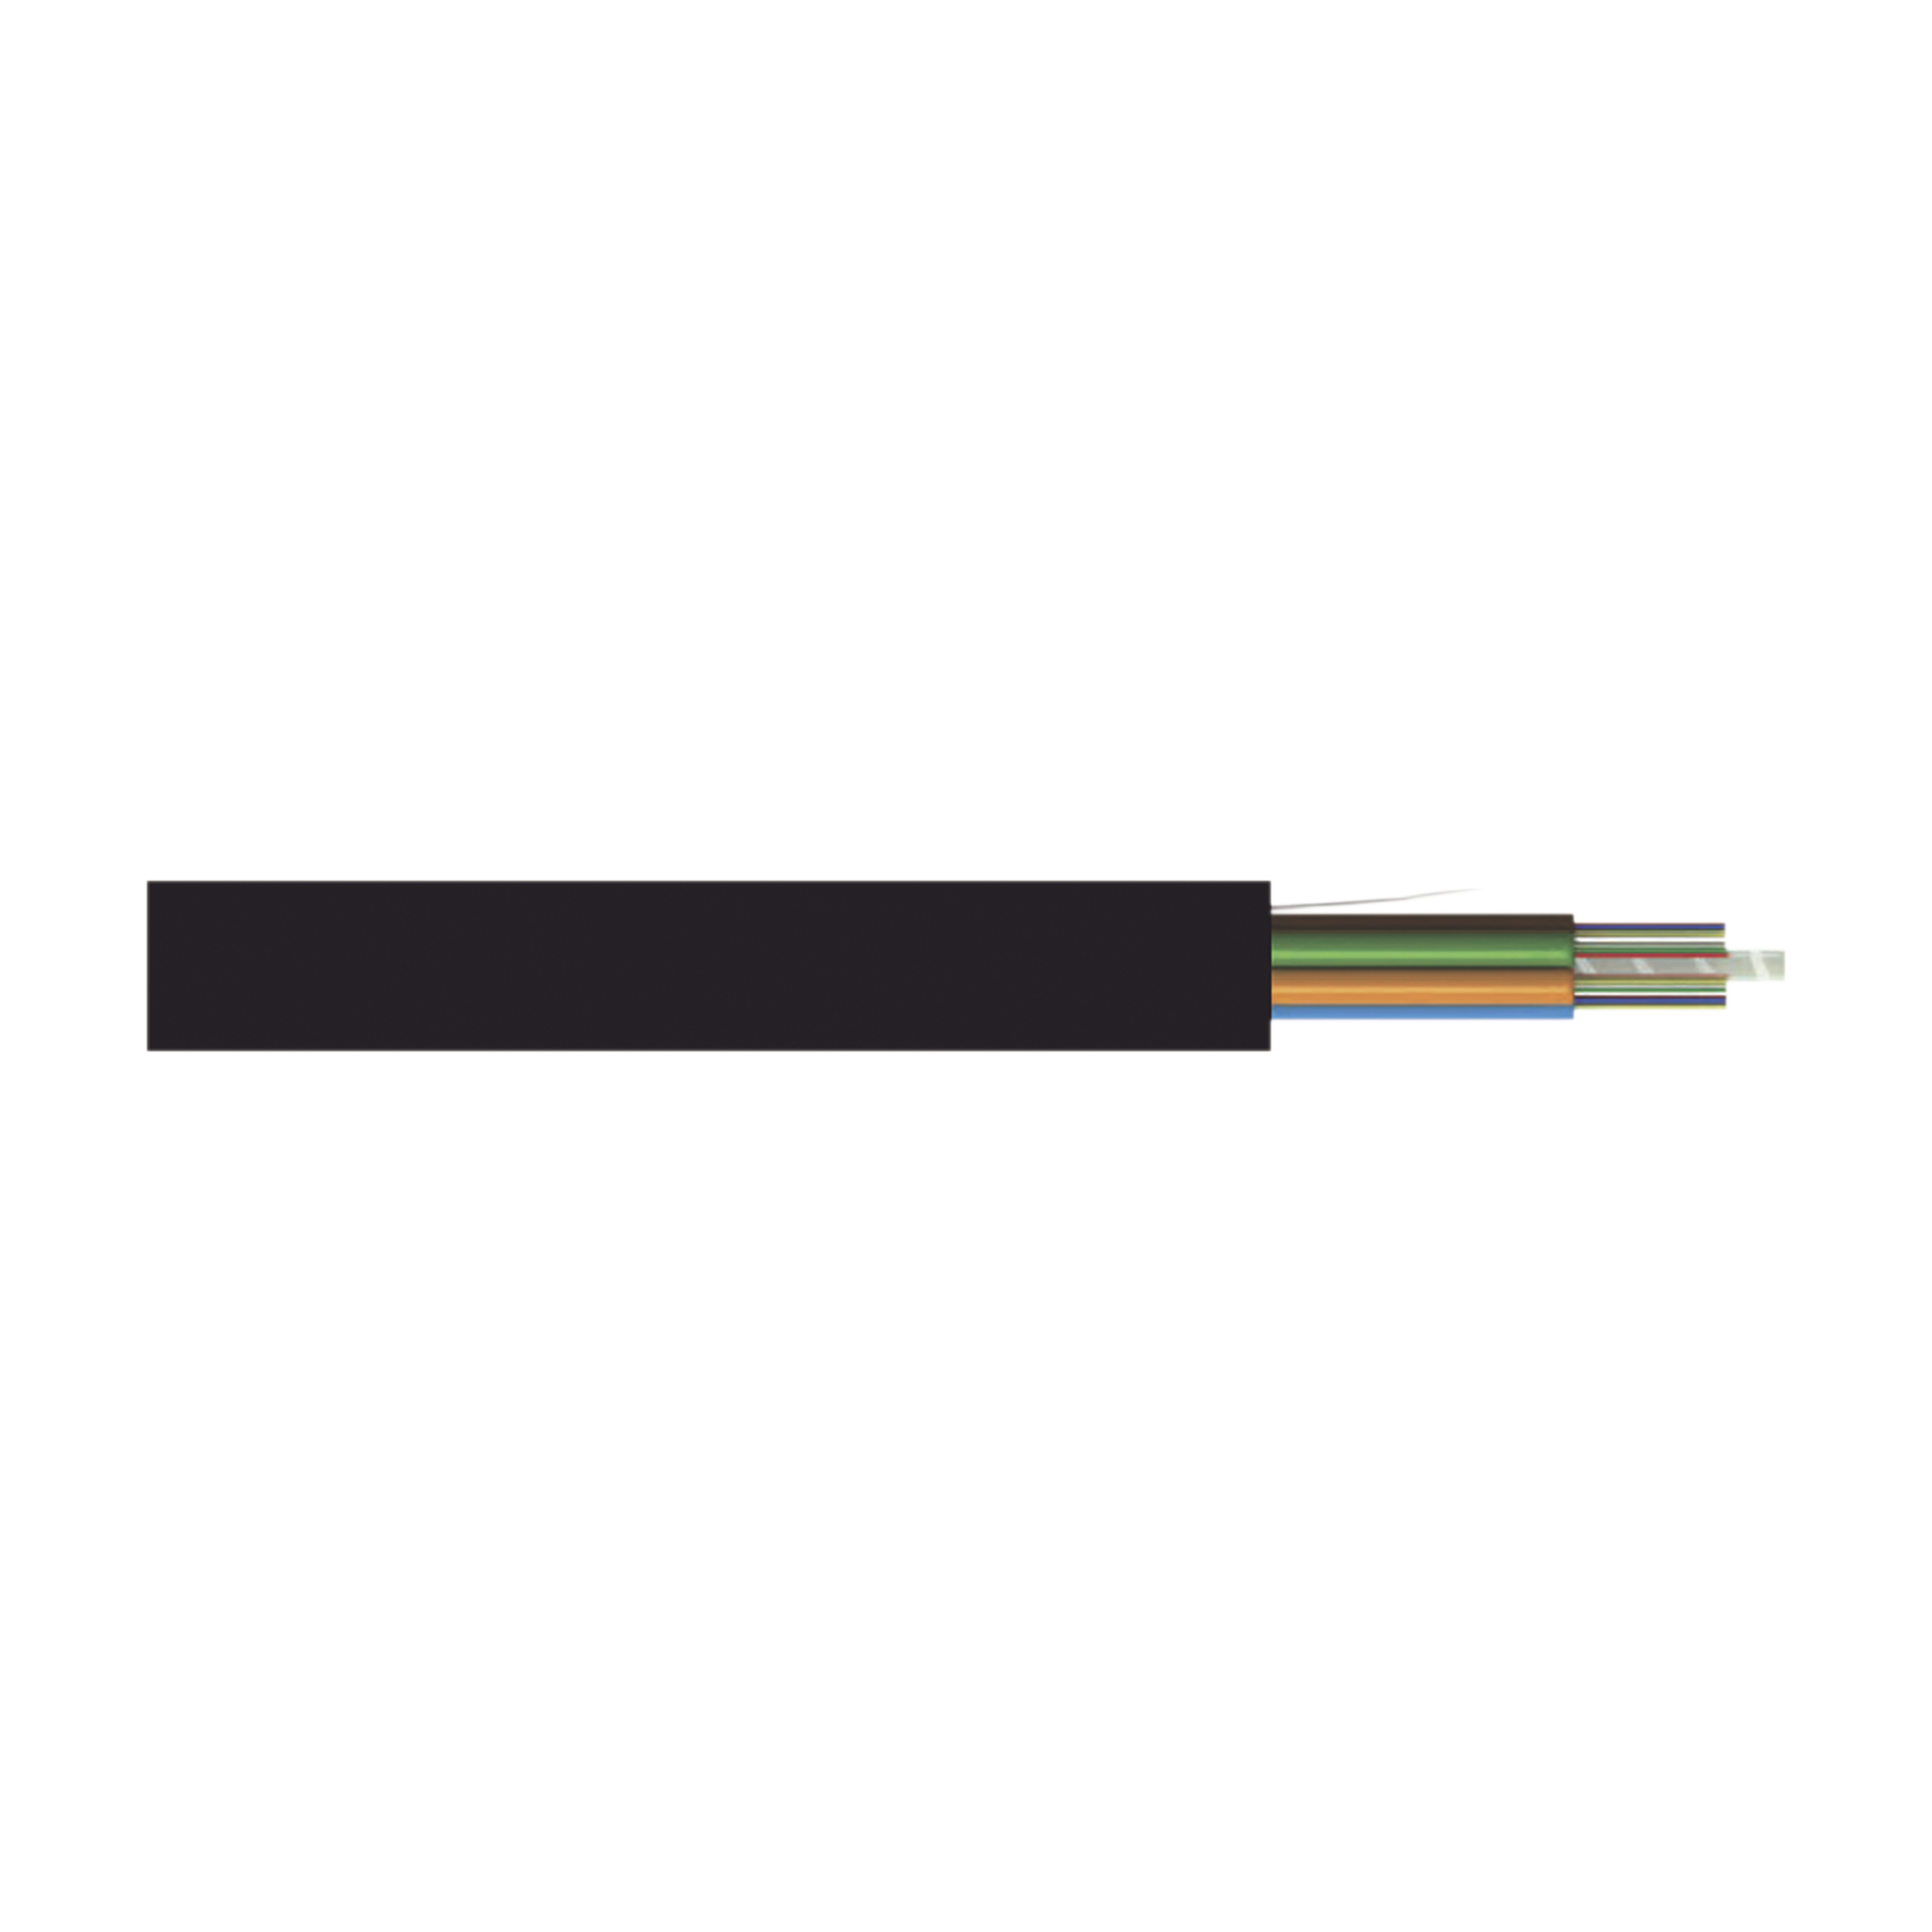 Bala IP 4 Megapixel / ULTRA BAJA ILUMINACIoN / 50 mts IR EXIR / Lente Mot. 2.8 a 12 mm / WDR / IP67/ IK10 / Video Analisis / Entrada-Salida audio y alarma / PoE+ / MicroSD